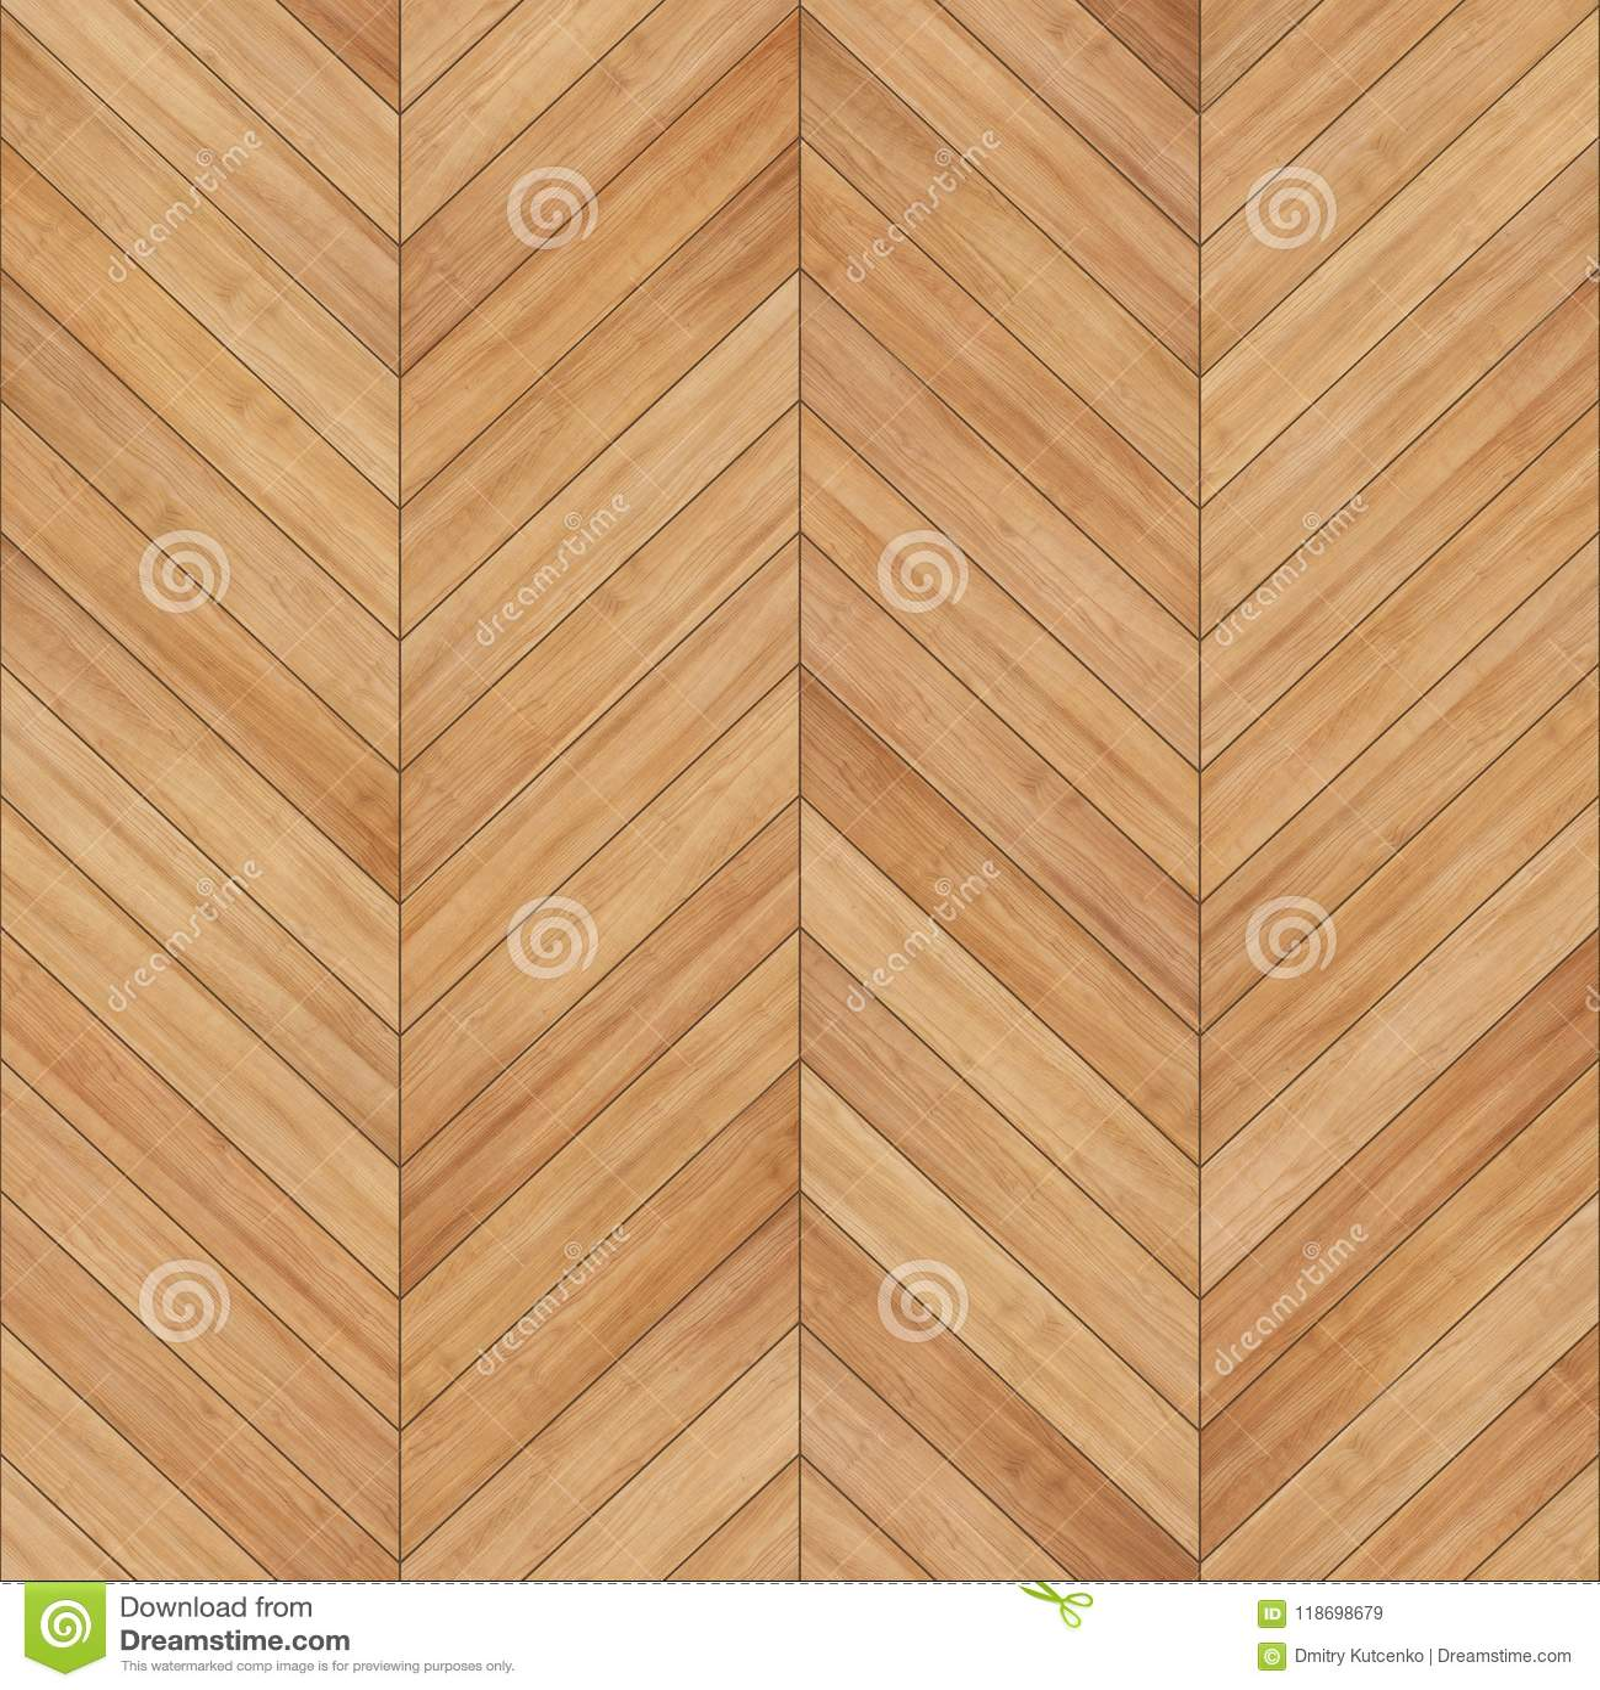 Seamless Wood Parquet Texture Chevron Light Brown Stock Image